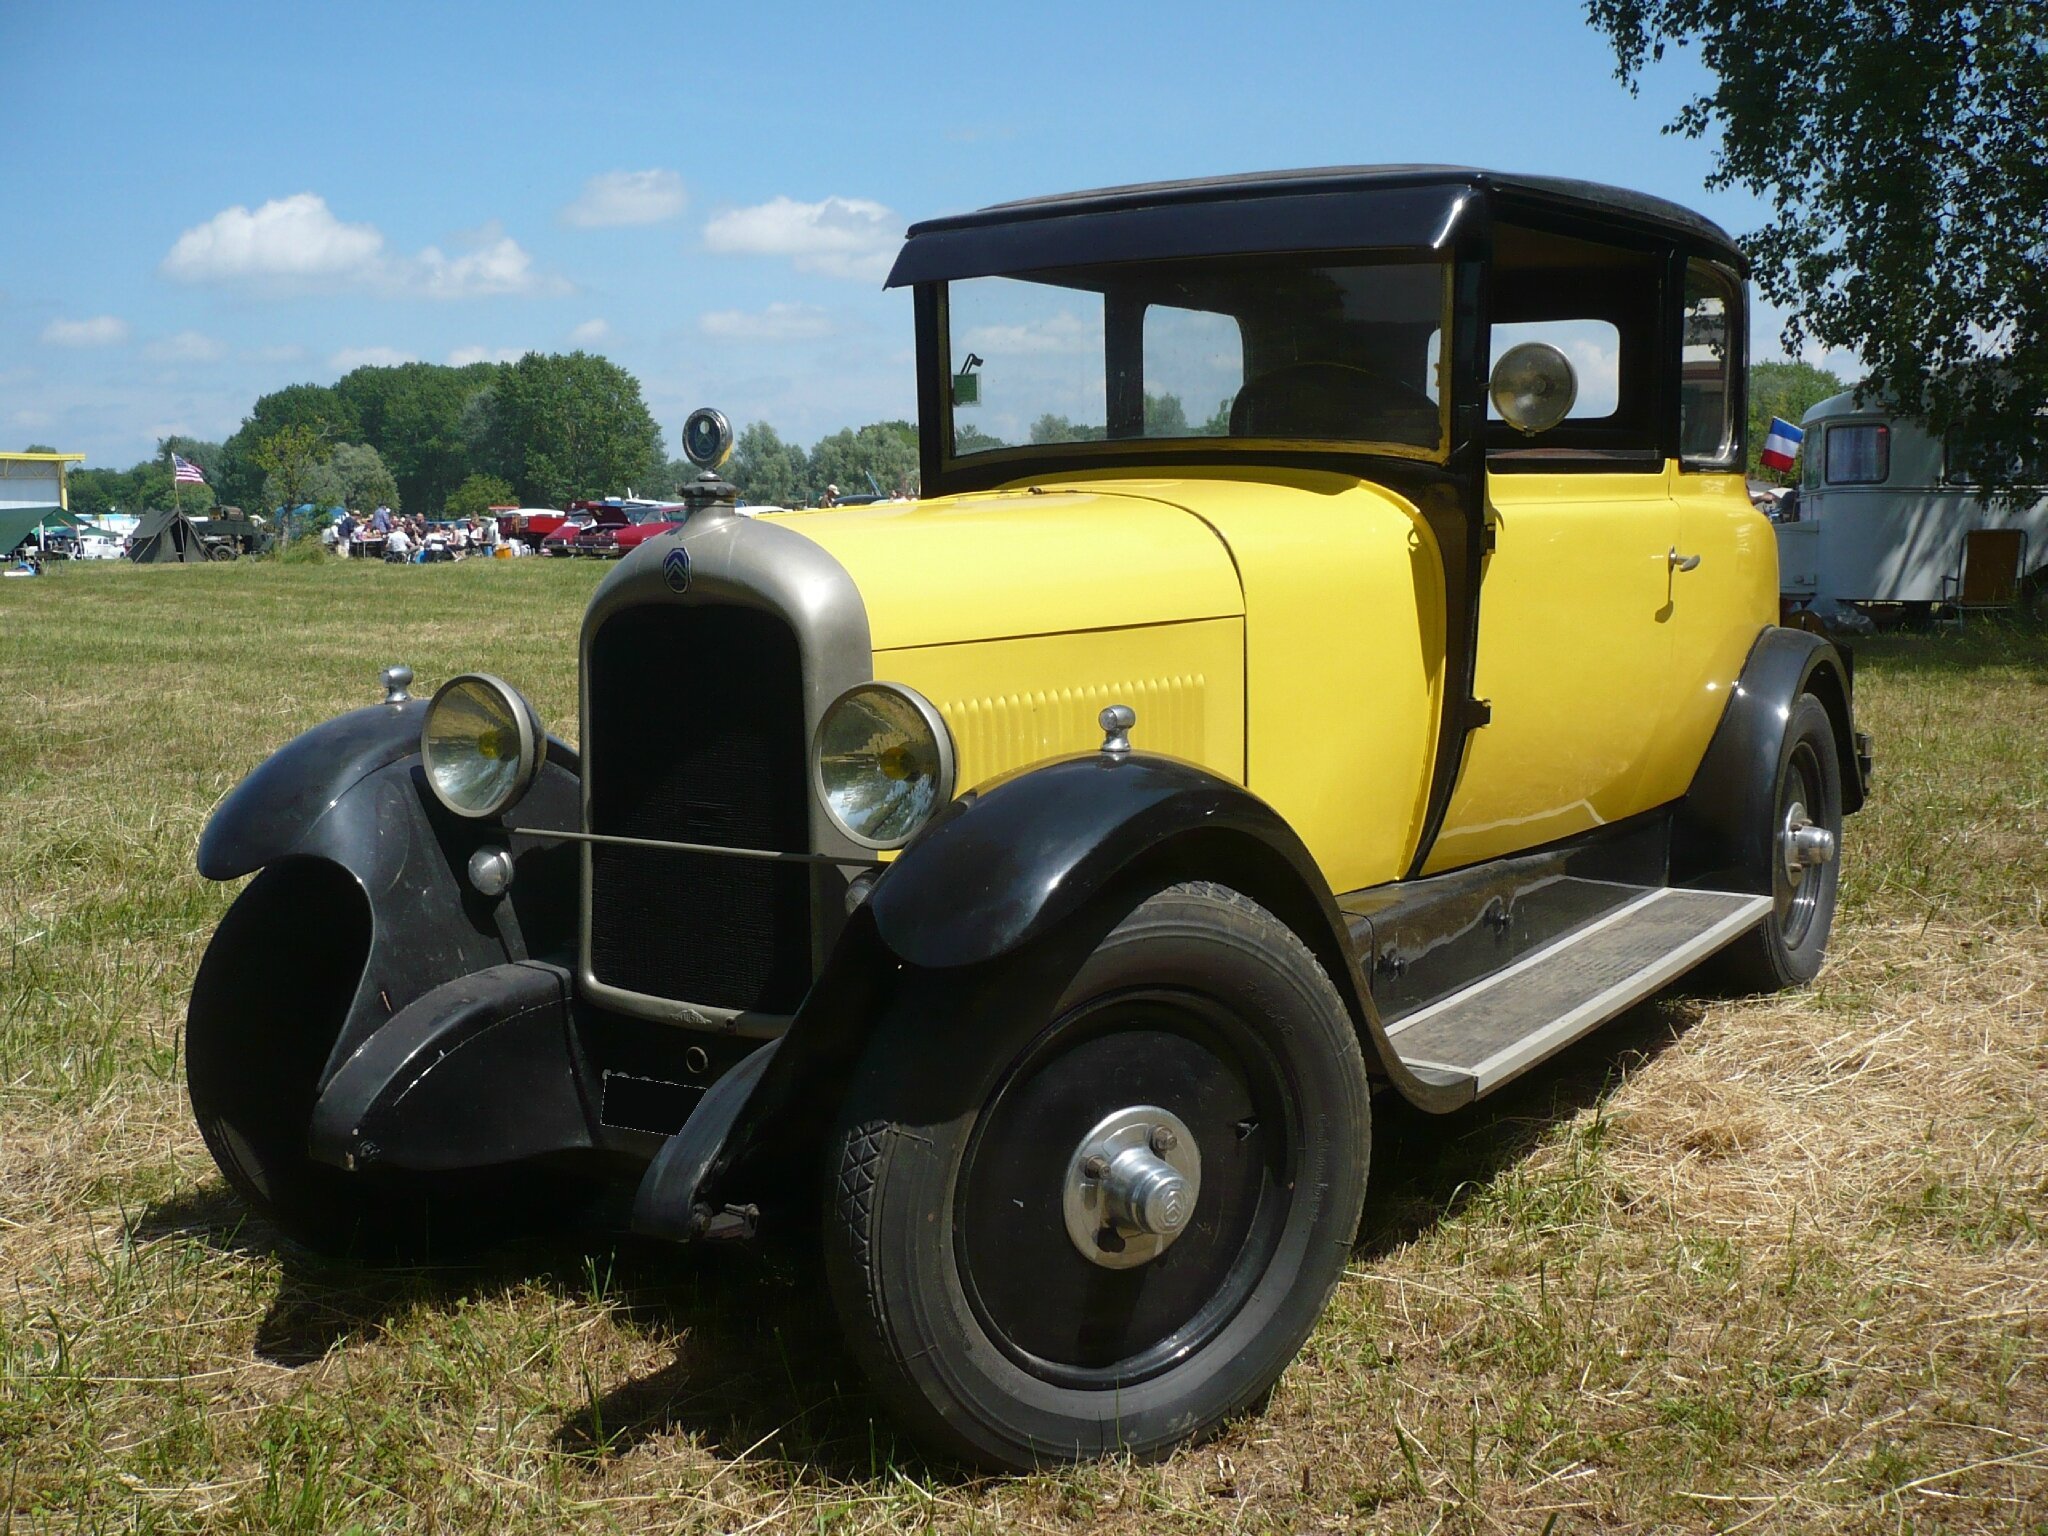 CITROËN B14 Faux Cabriolet 1929 Madine (1)